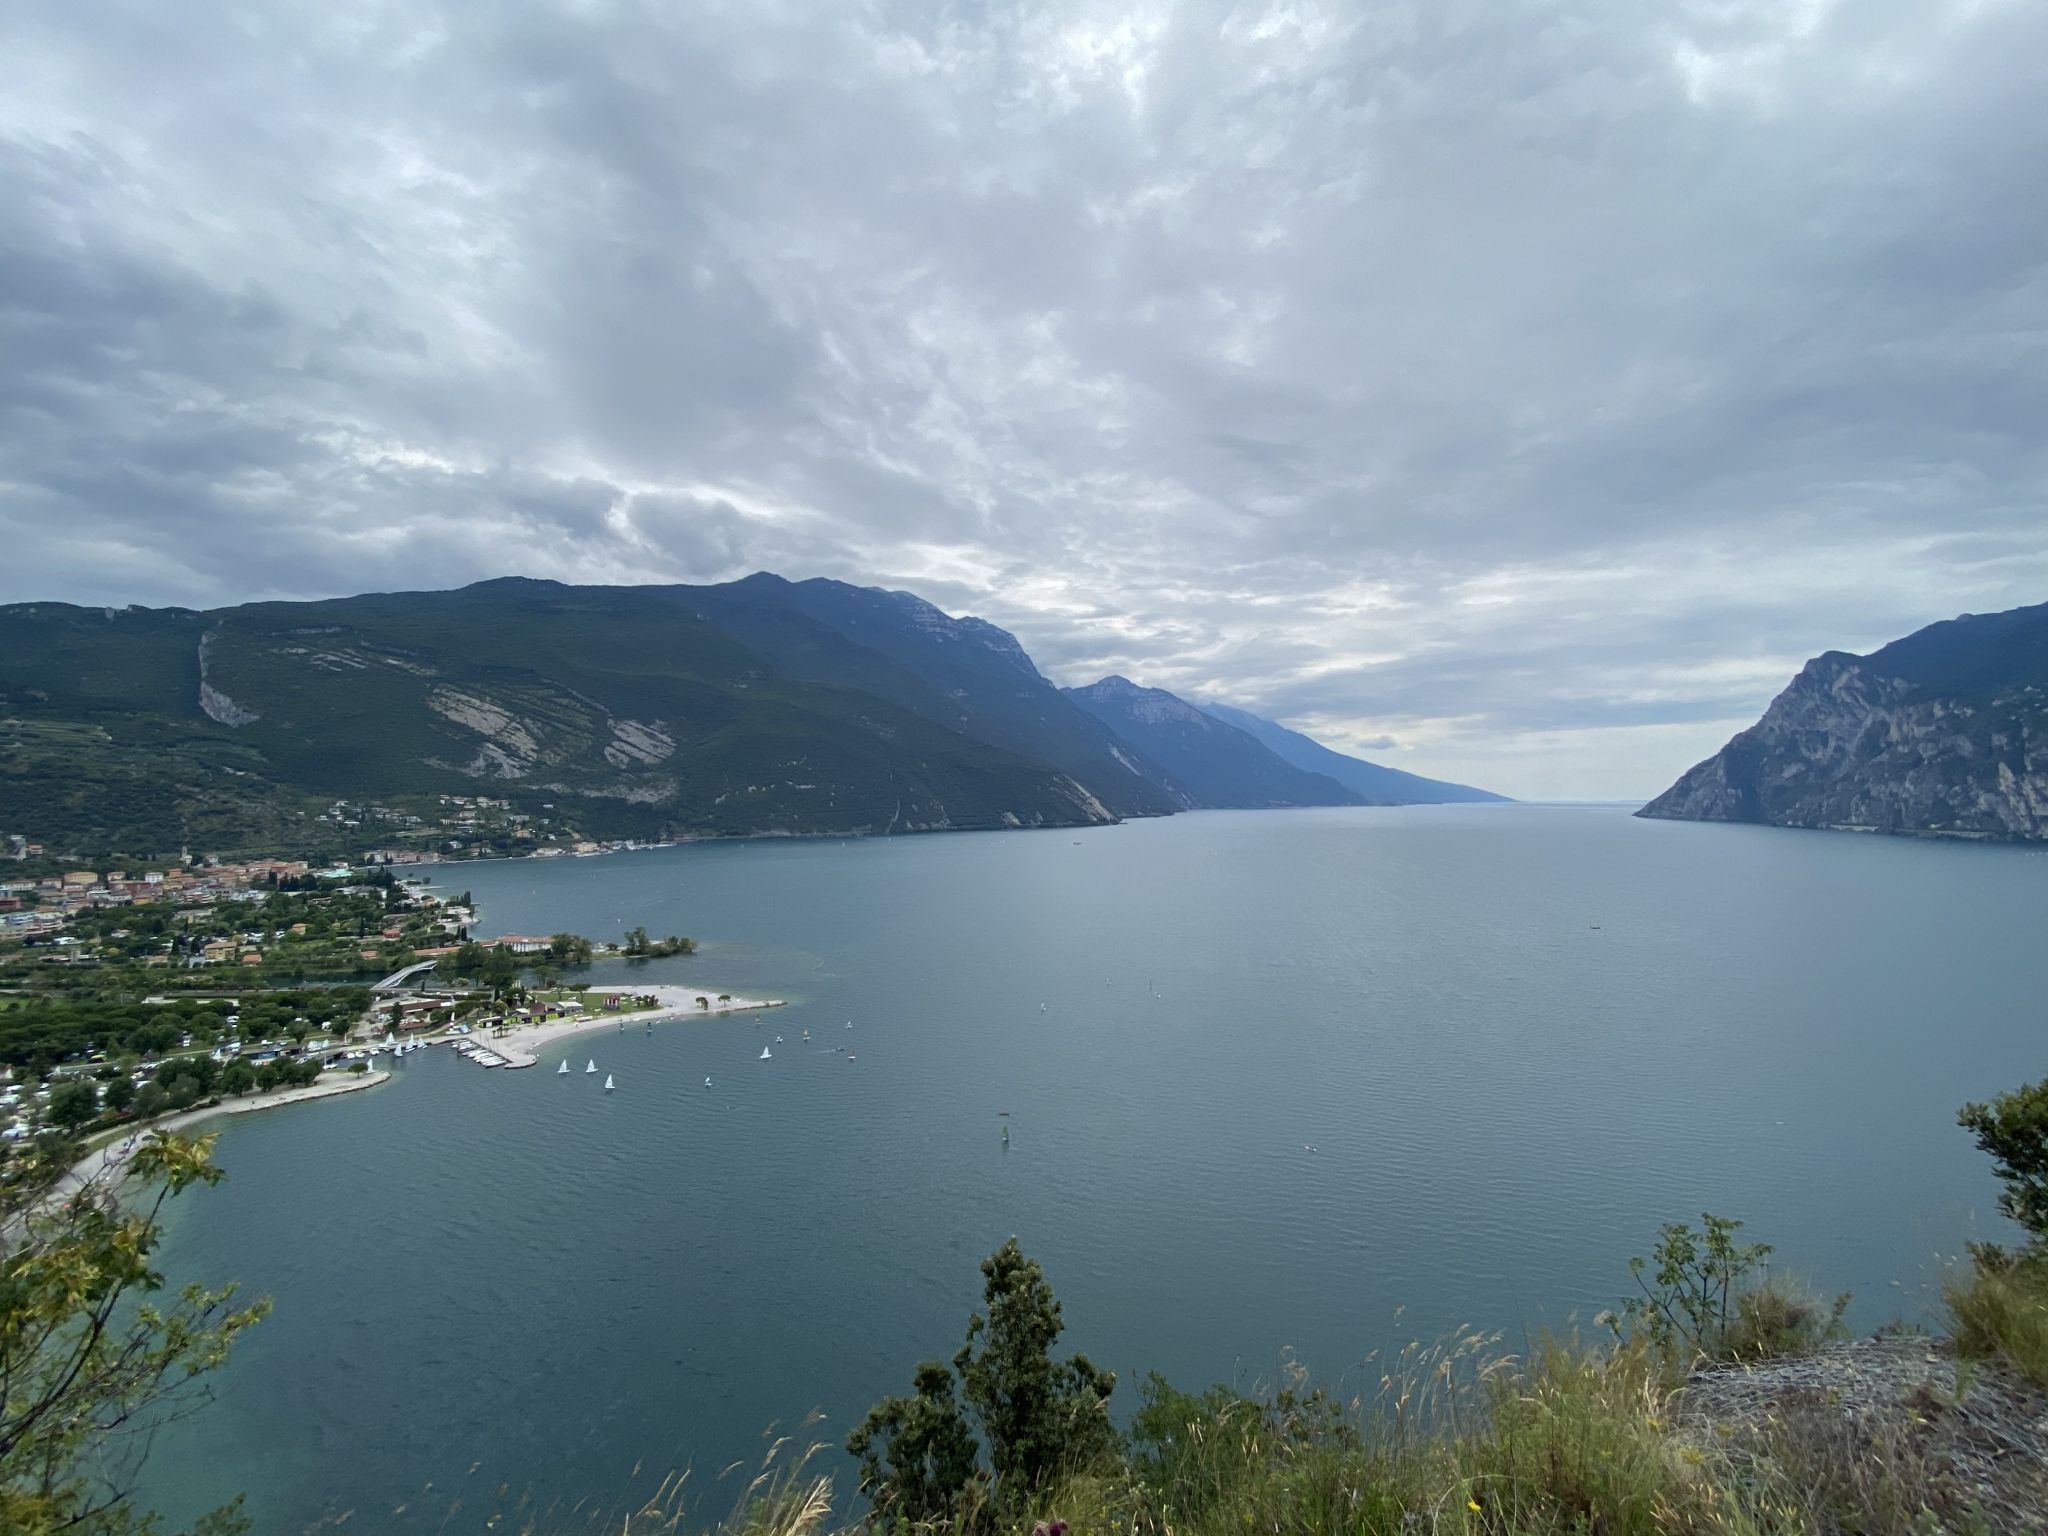 Forte Garda, Riva, Lake Garda, Italy, Italy